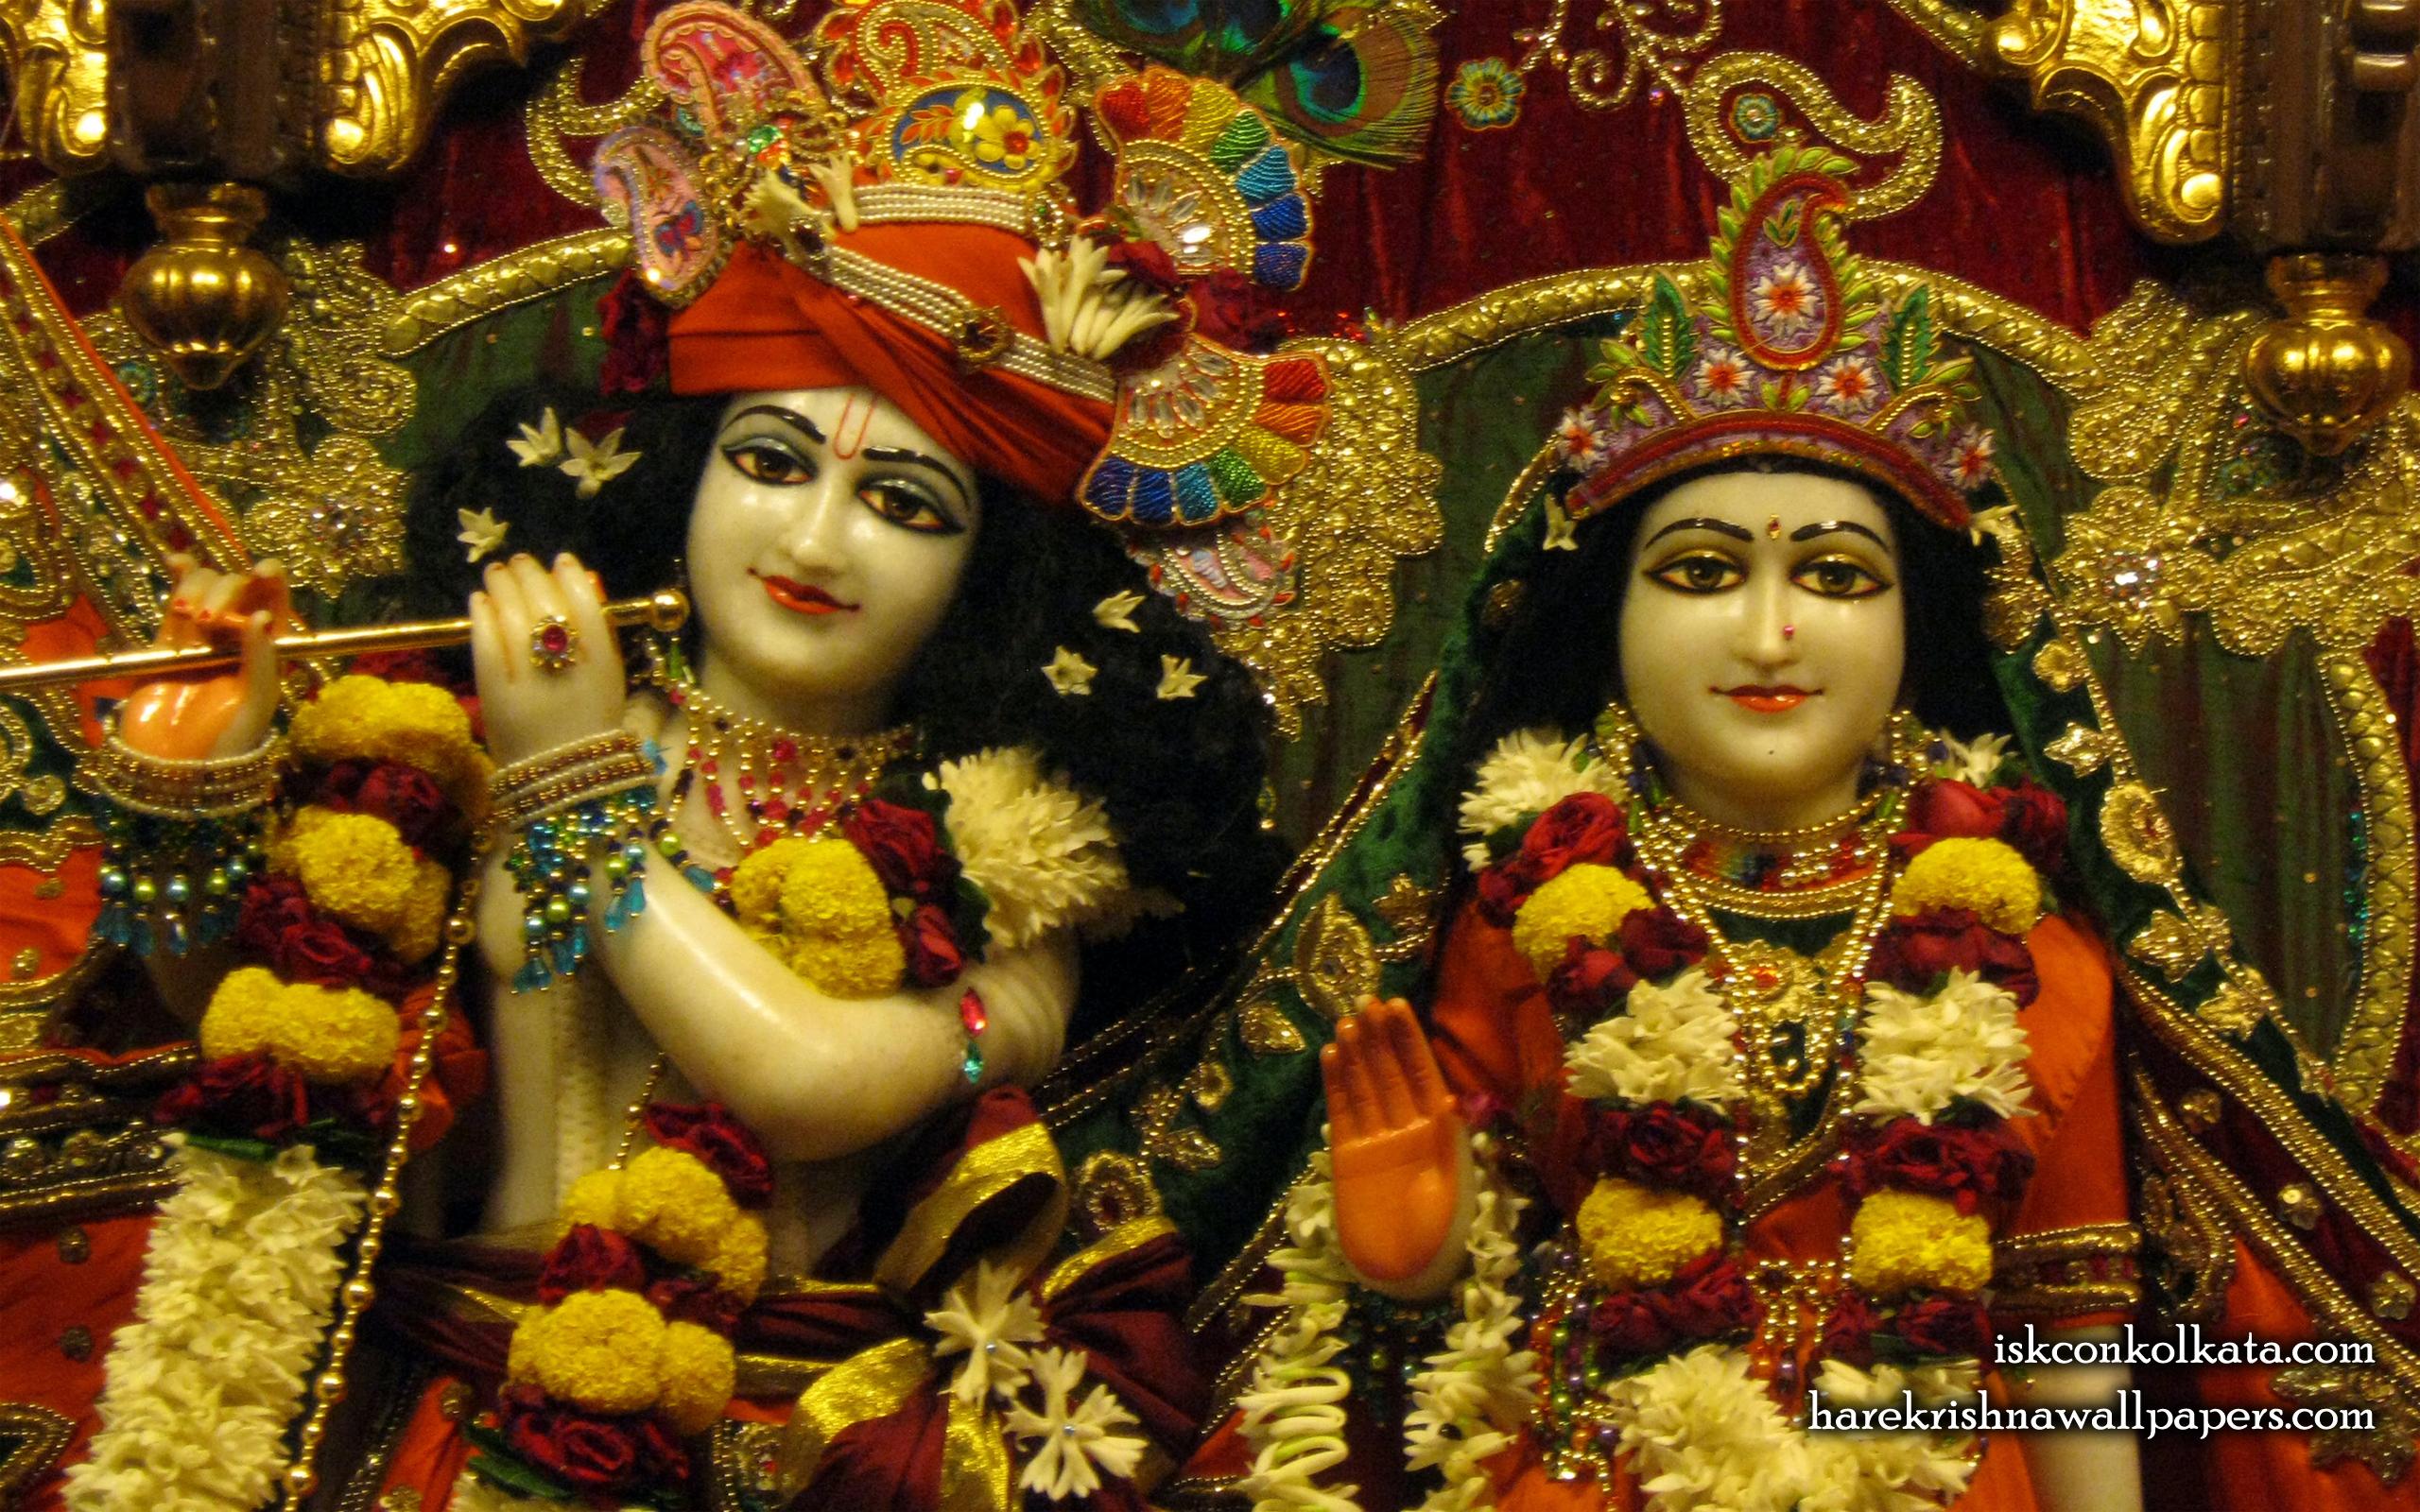 Sri Sri Radha Govinda Close up Wallpaper (002) Size 2560x1600 Download